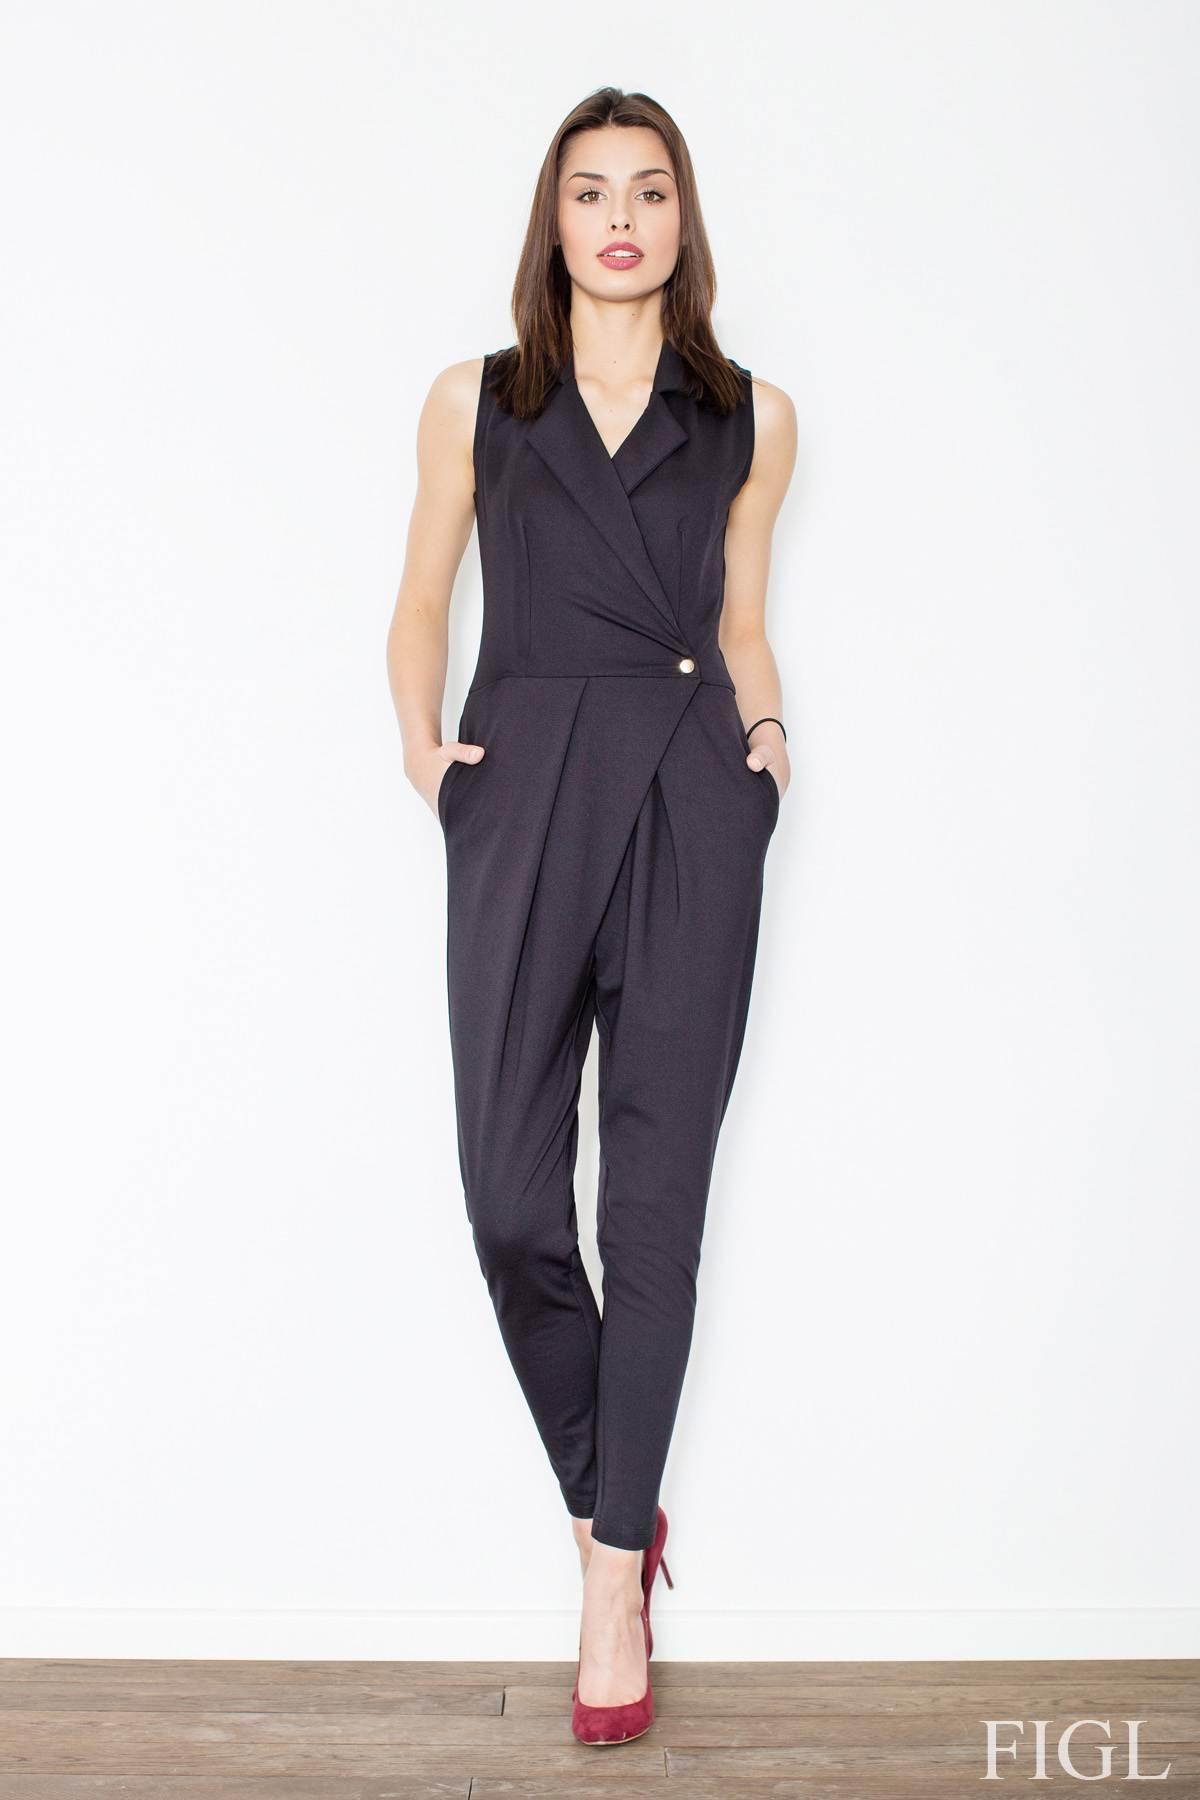 83e783cd5fa Γυναικείες Φόρμες - Ακριβότερα Προϊόντα - Σελίδα 29 | Outfit.gr